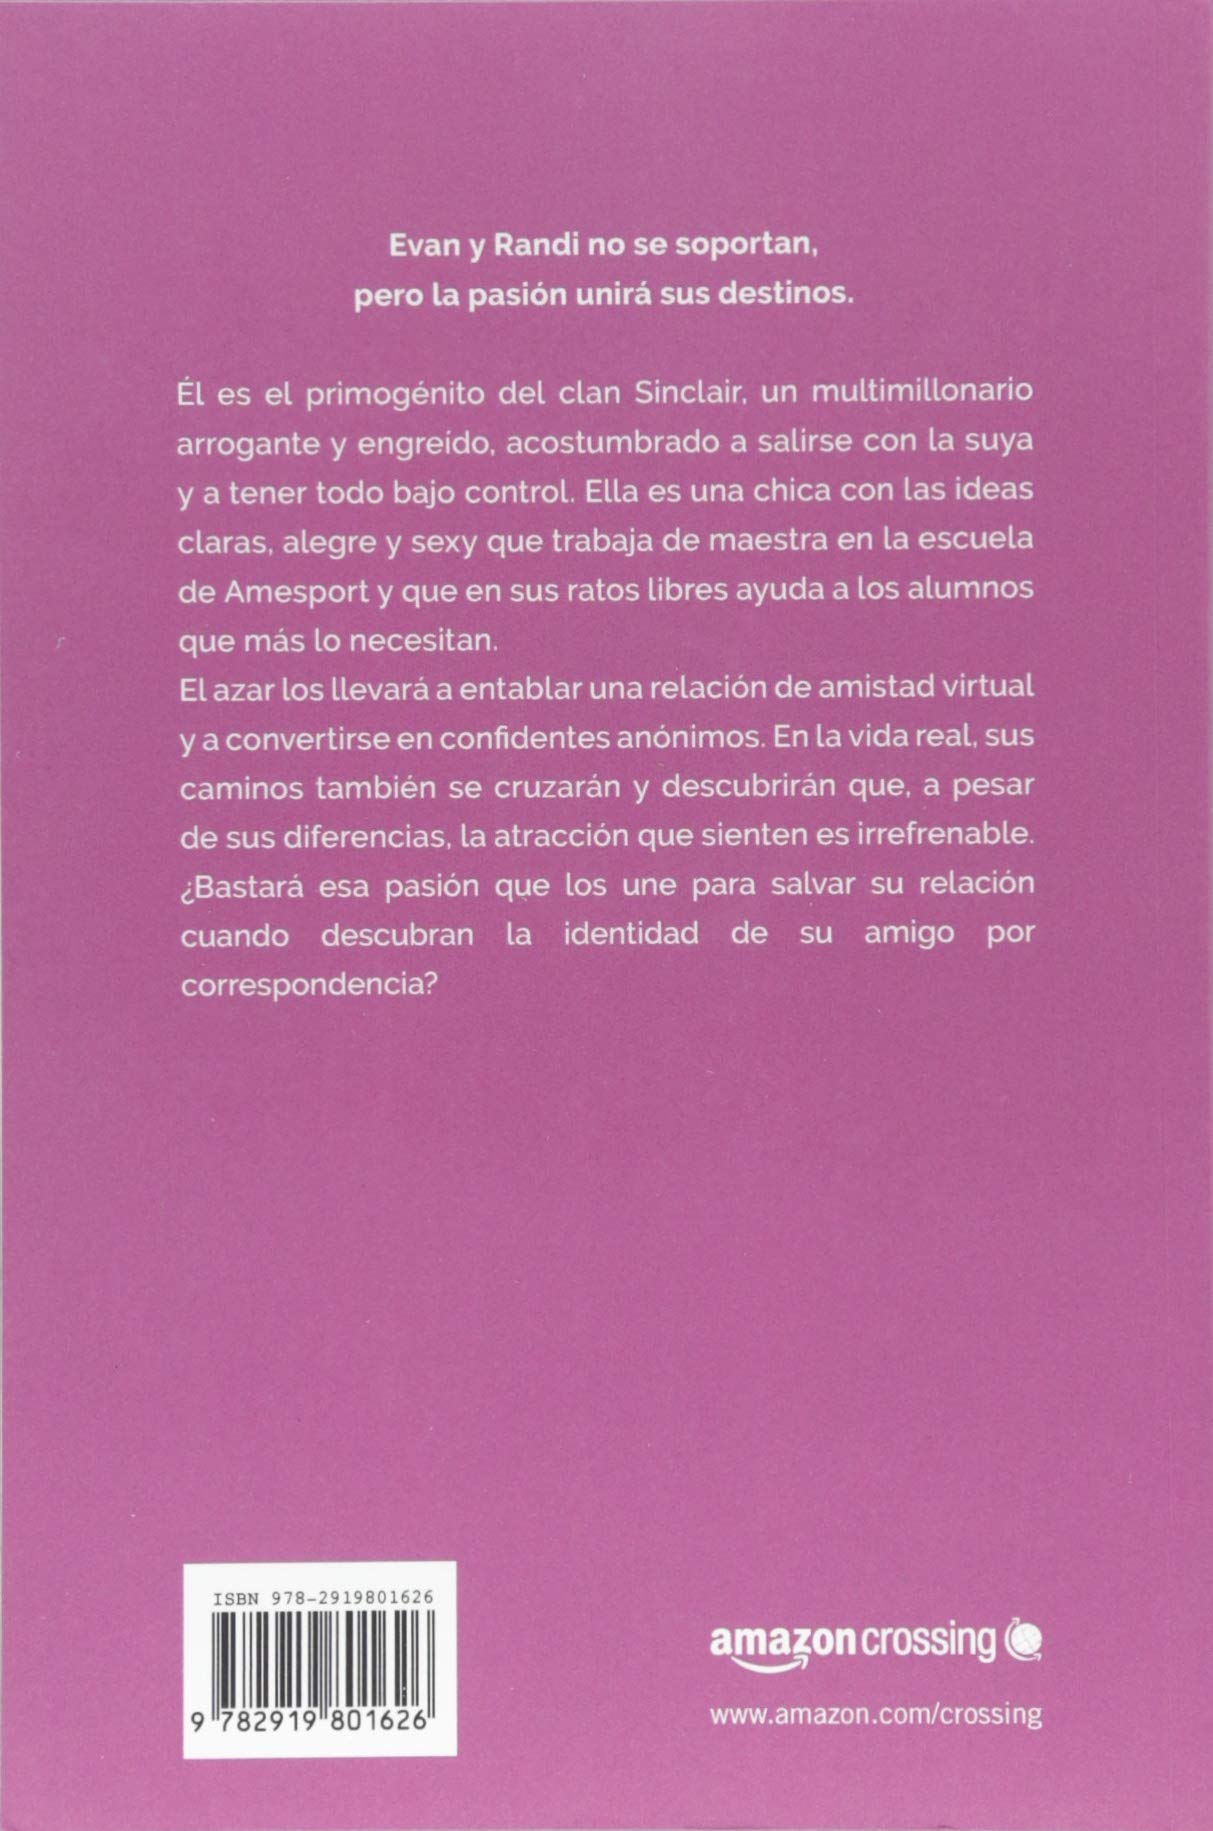 El mensaje del multimillonario (Los Sinclair) (Spanish Edition): J. S.  Scott, Roberto Falcó Miramontes: 9782919801626: Amazon.com: Books